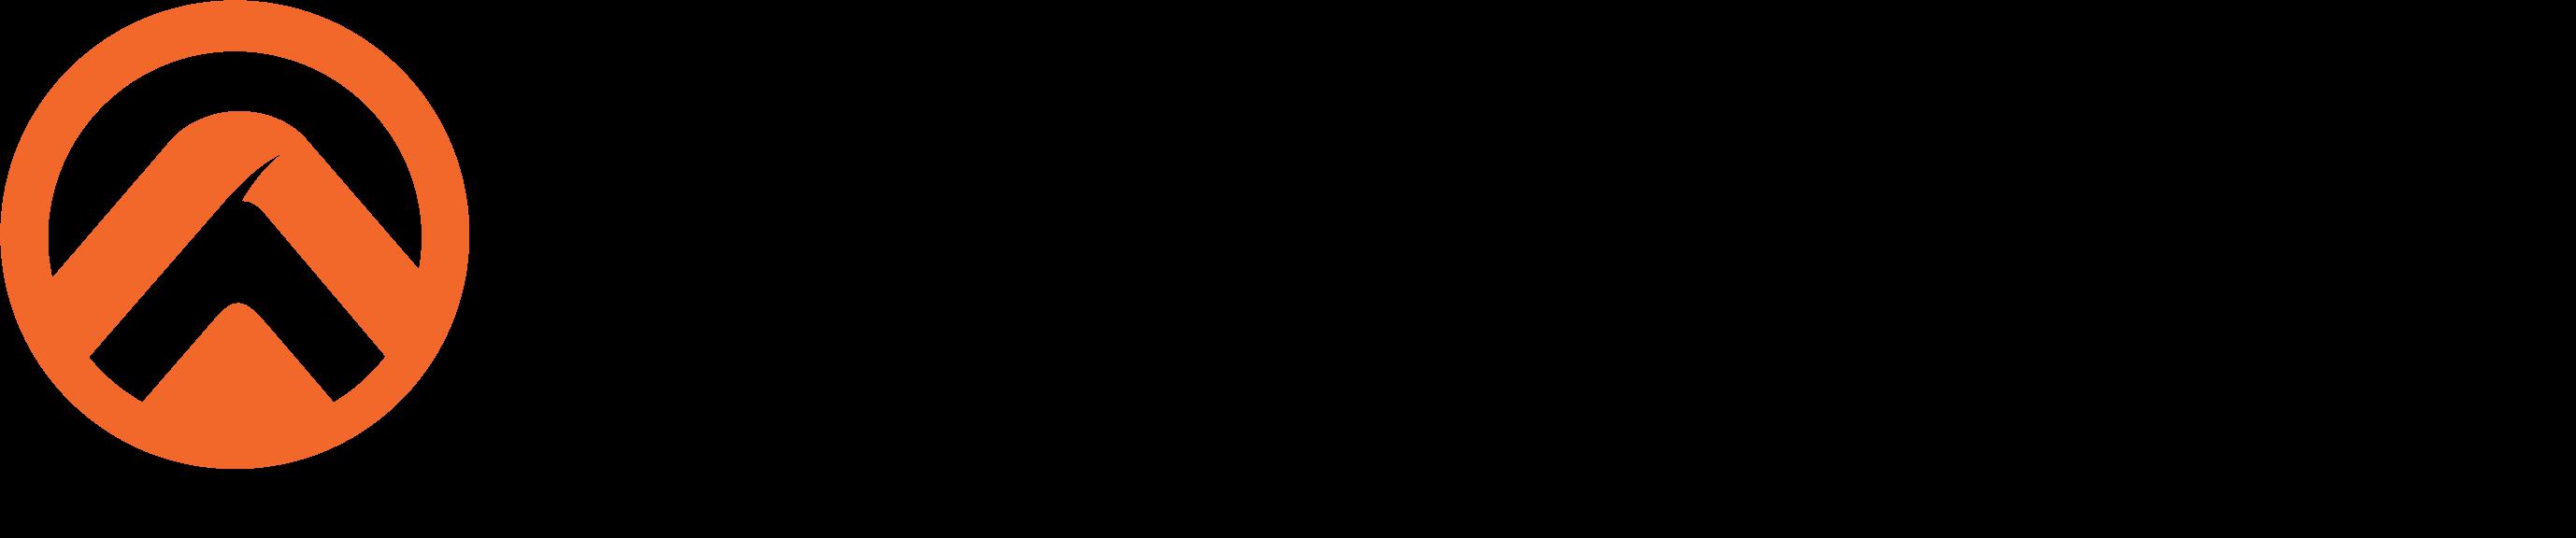 https://campaign-image.com/zohocampaigns/78131000008018004_zc_v45_philips_logo.jpg